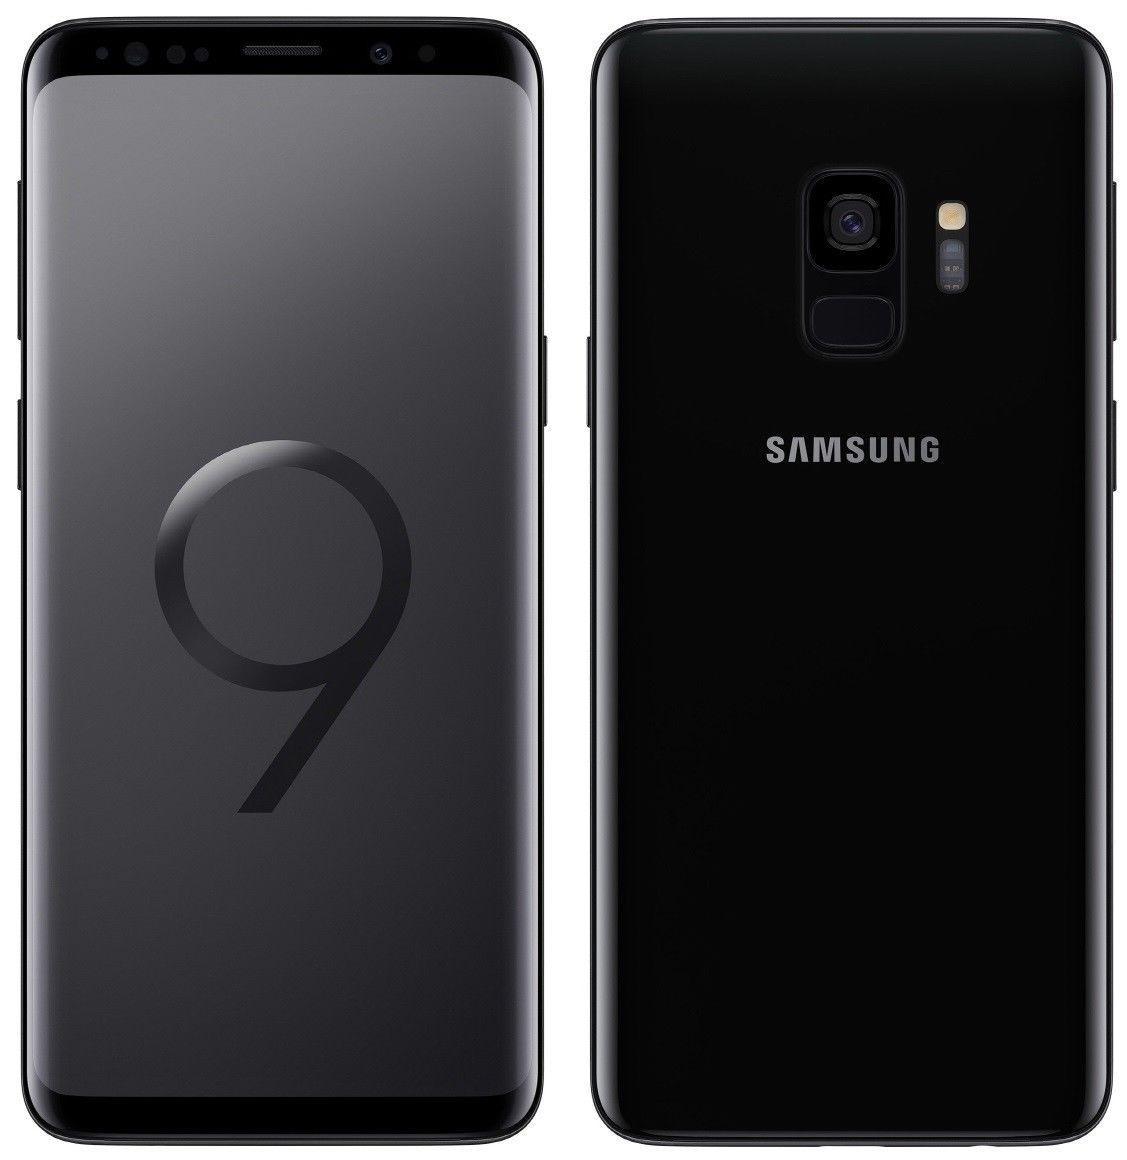 Samsung G960F U2 MDM Lock Remove File Without Box - PC HOME